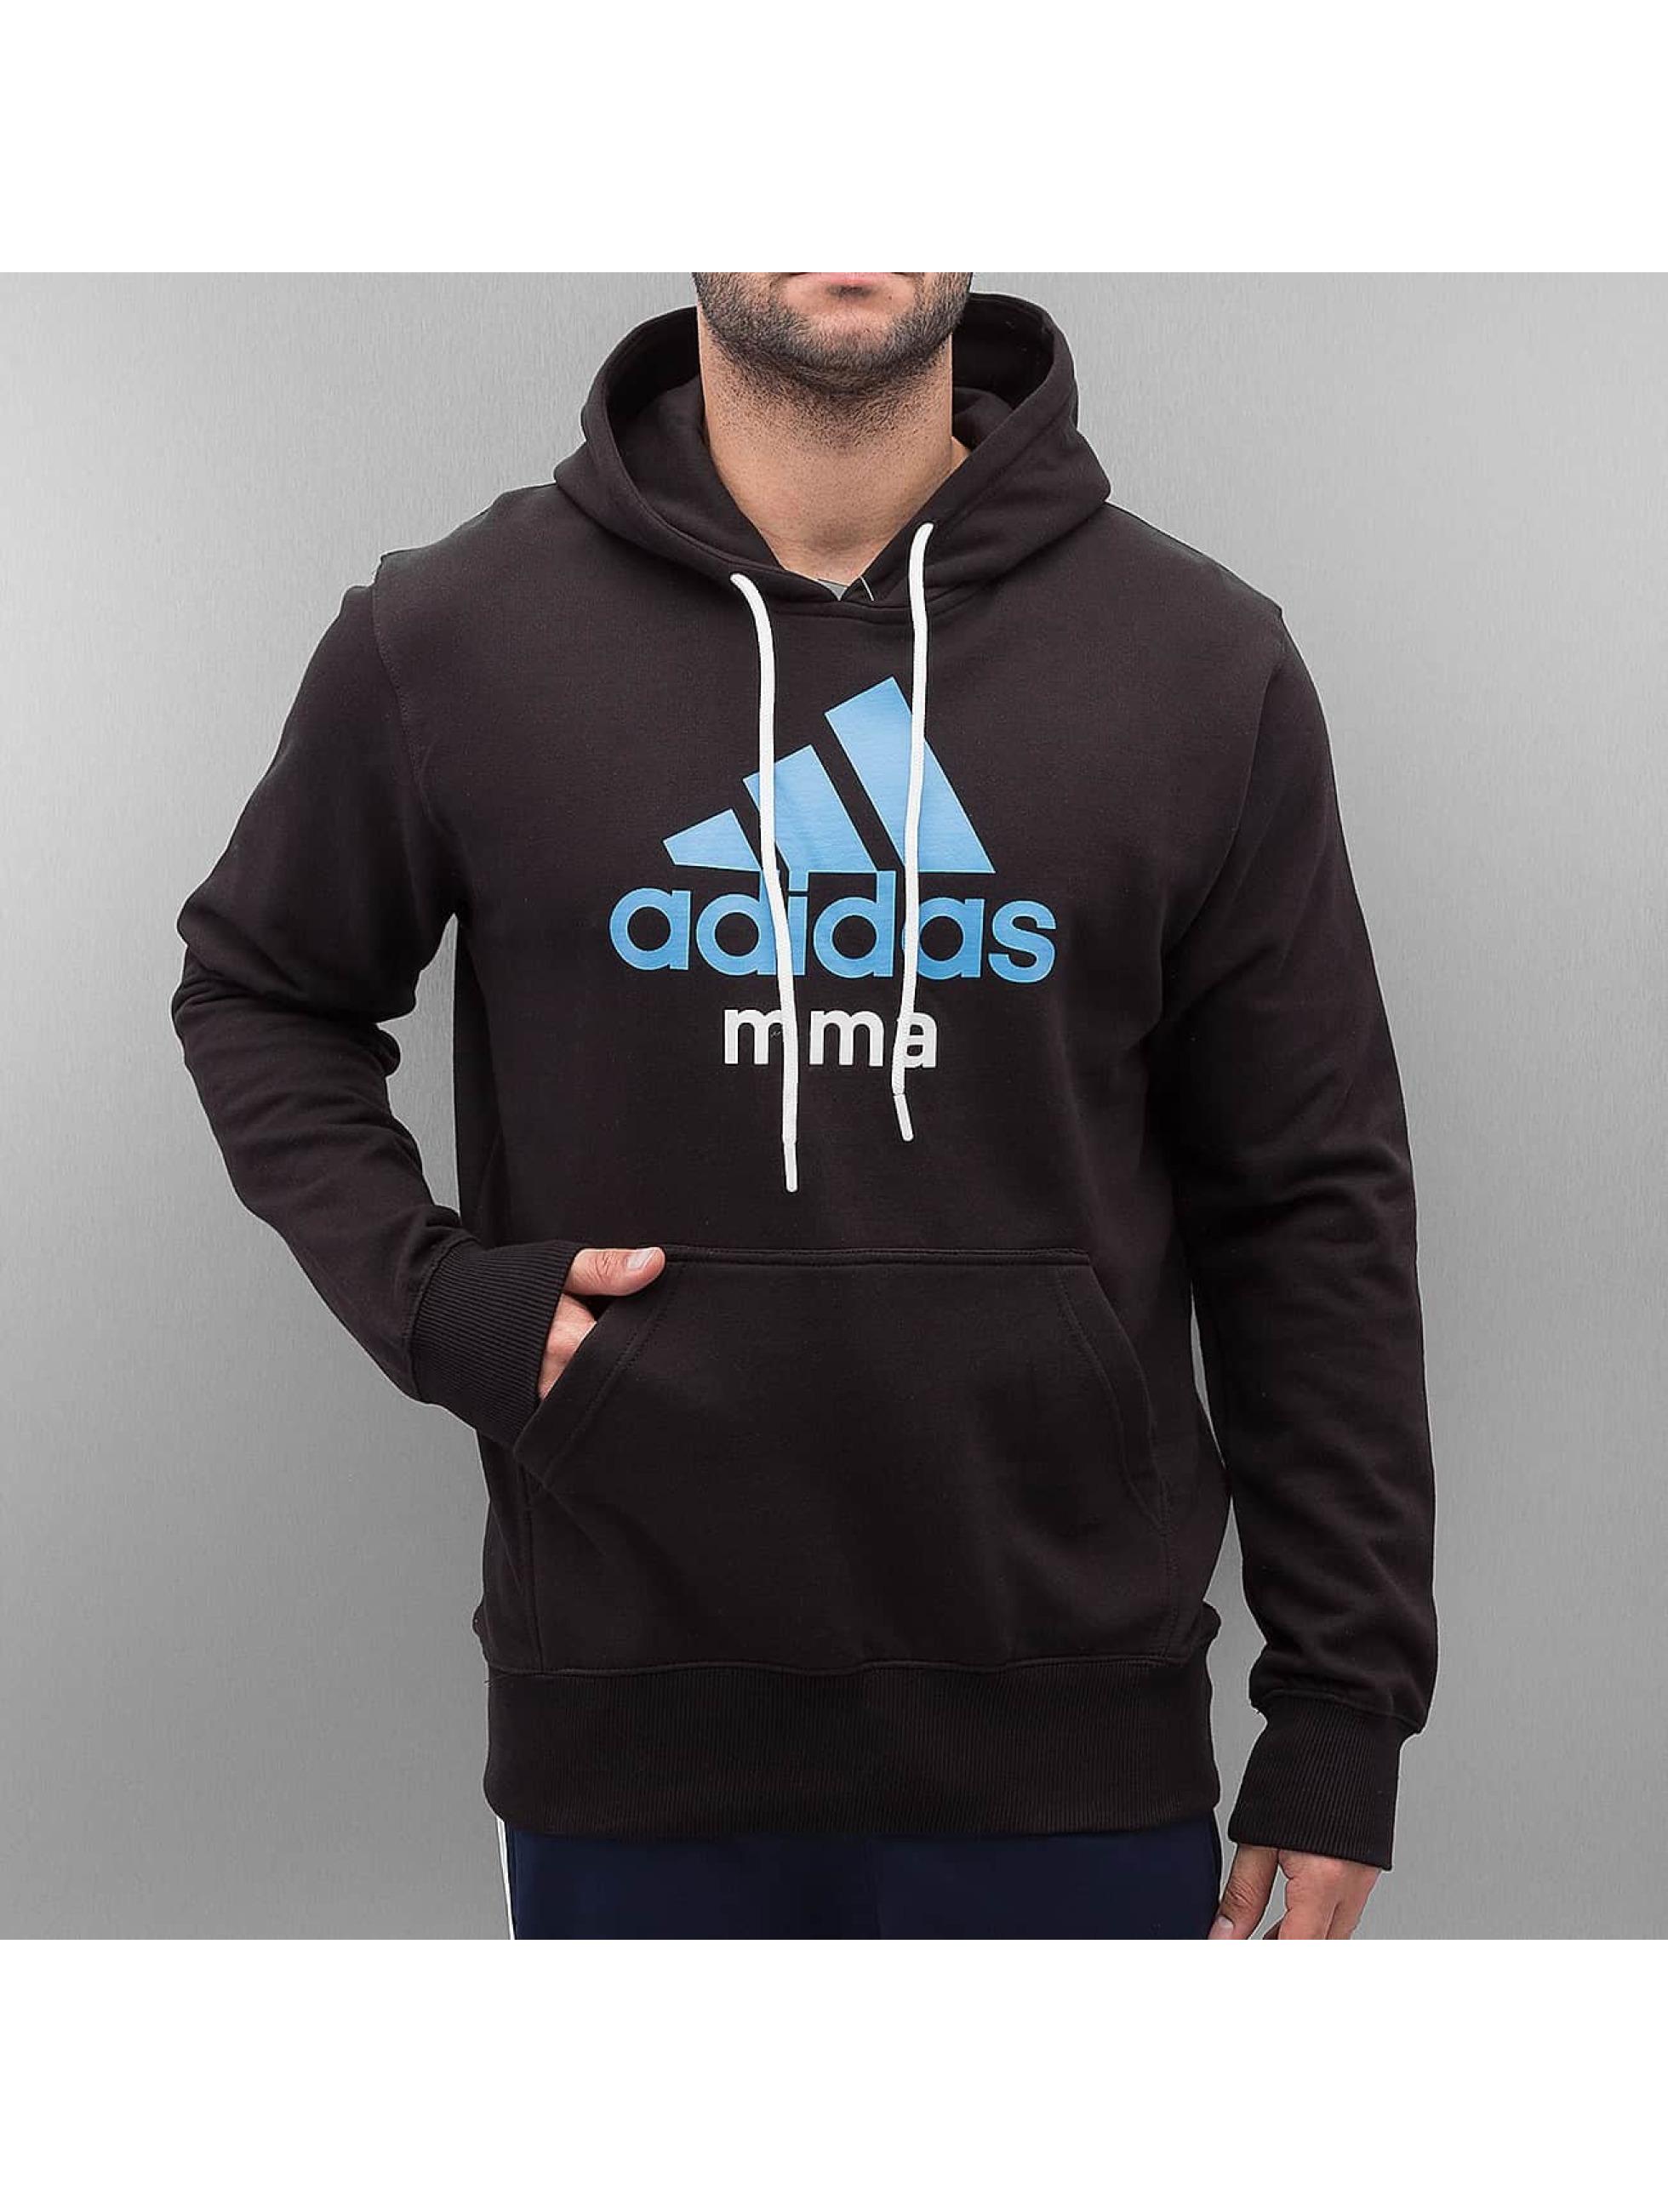 Adidas Boxing MMA Hoodie Boxing MMA Community black